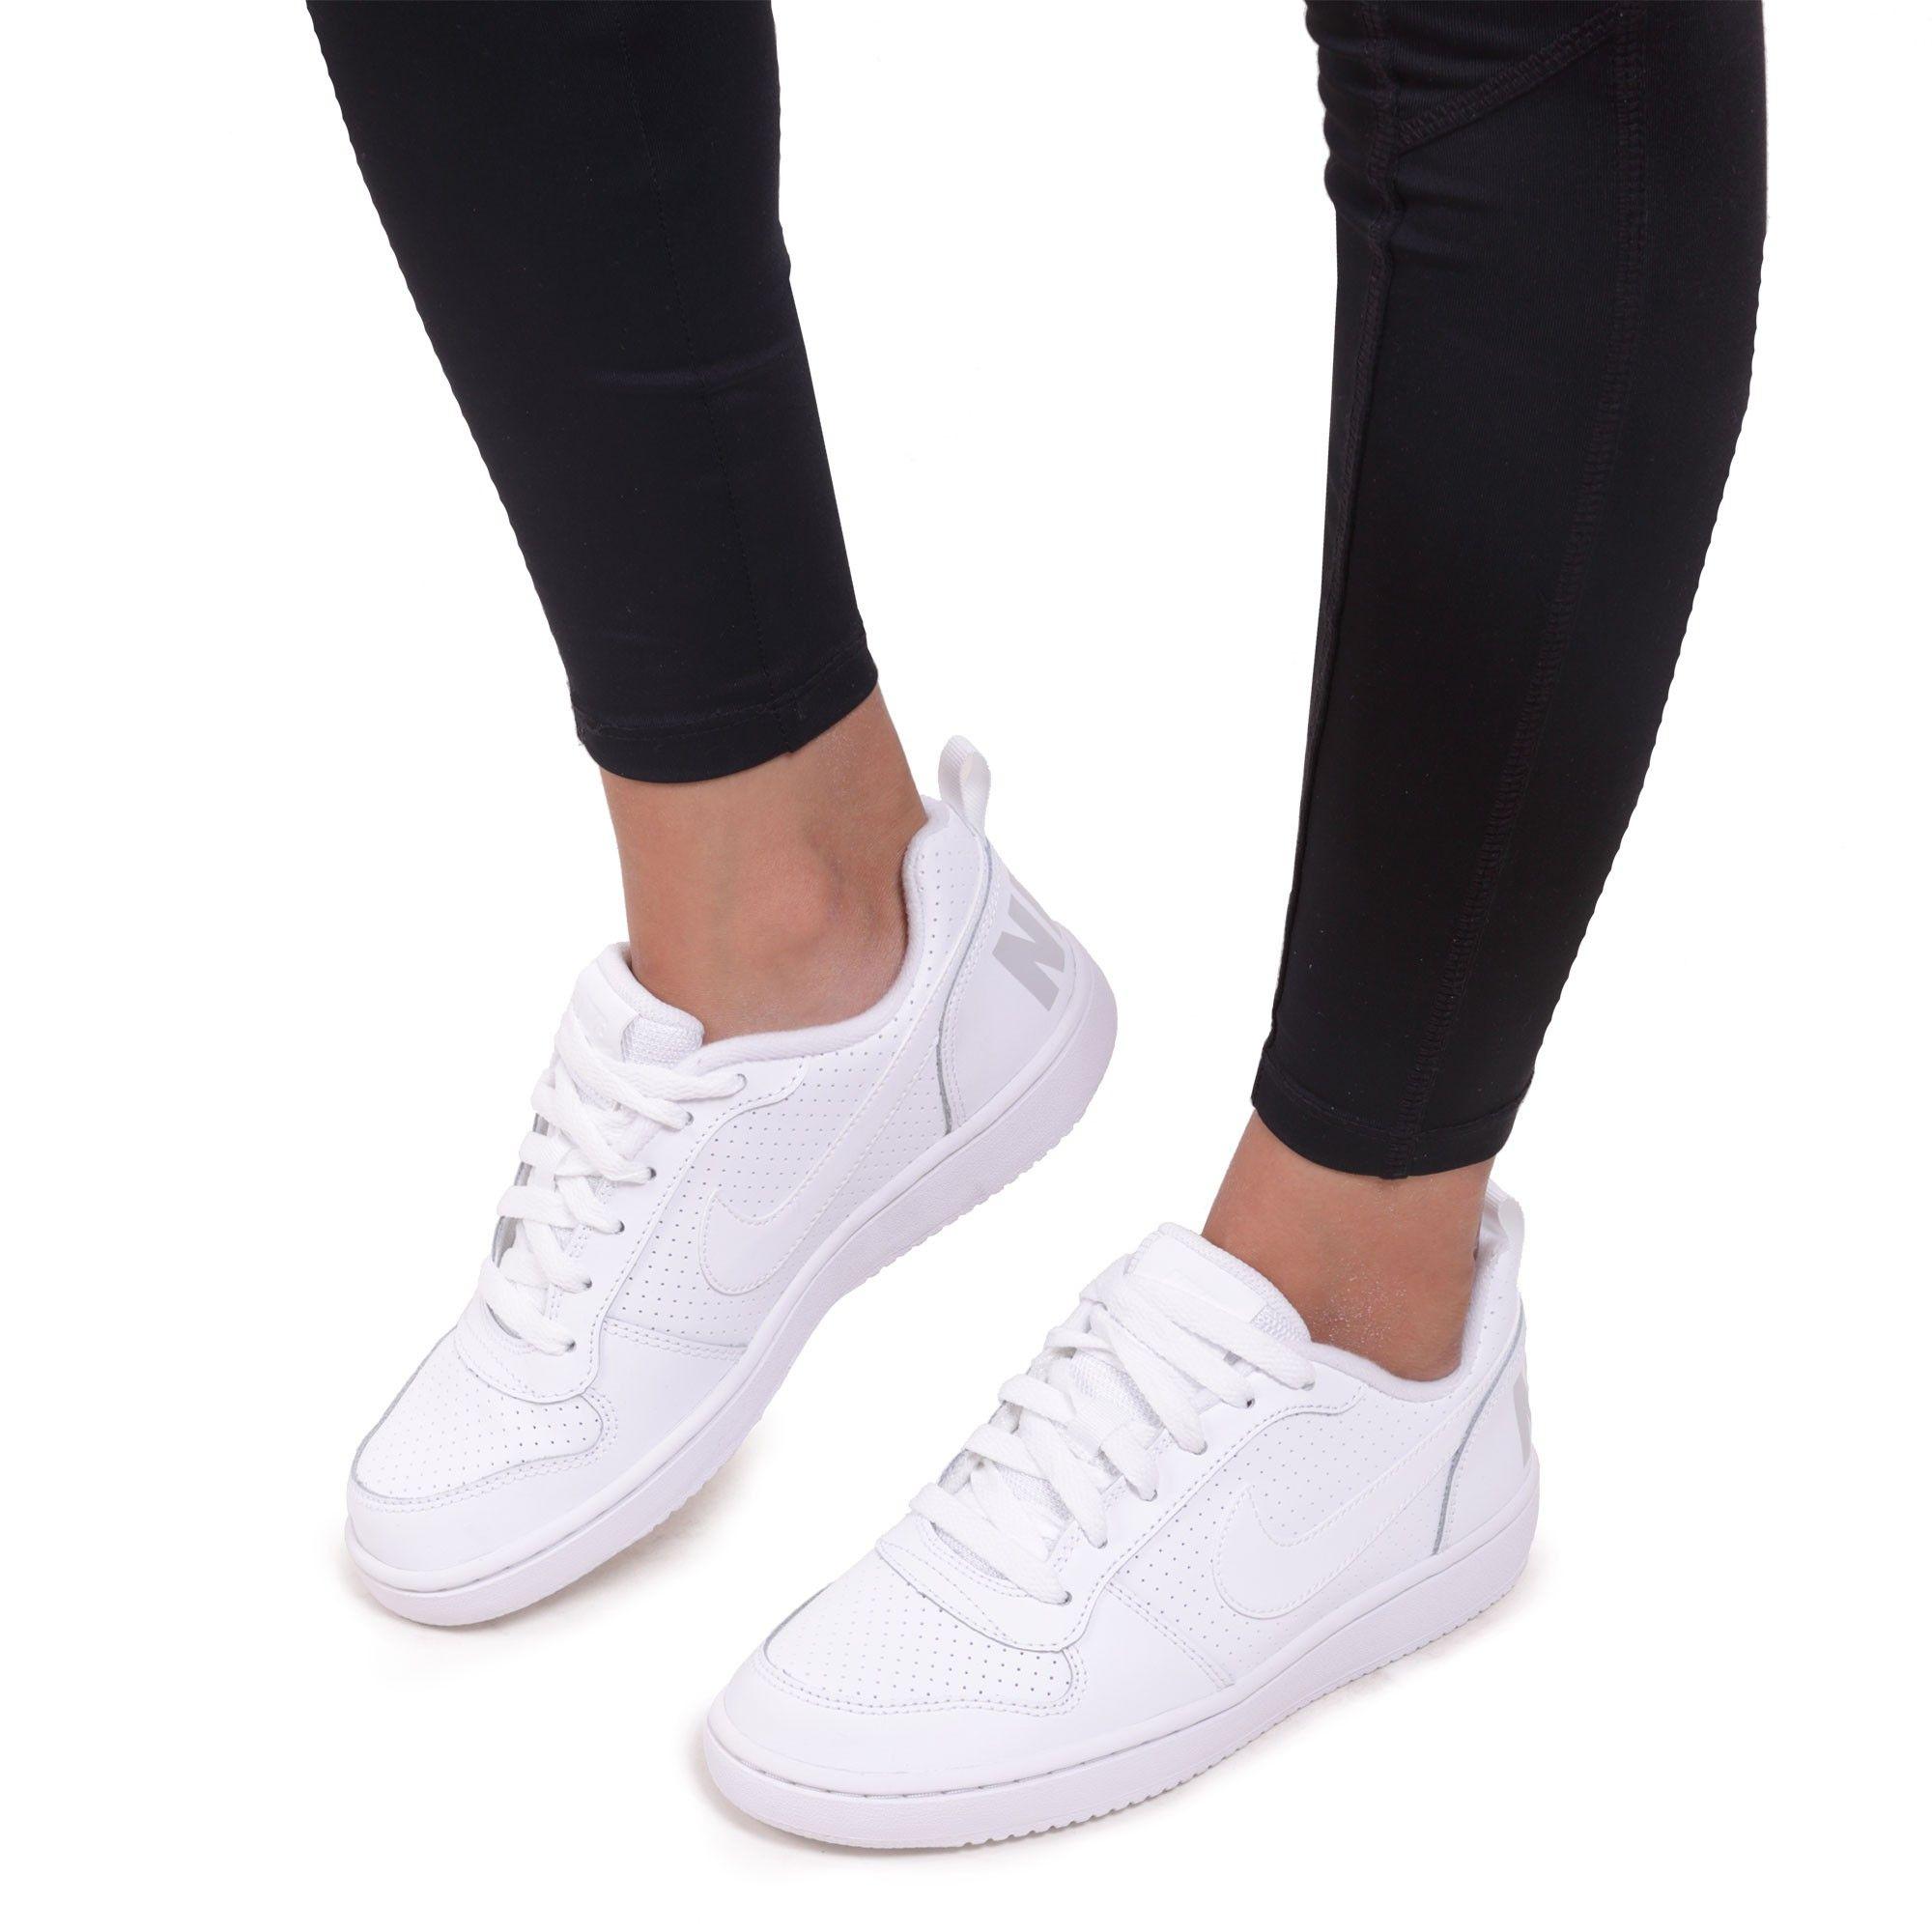 Nike Women S Court Borough Low Basketball Shoes Review